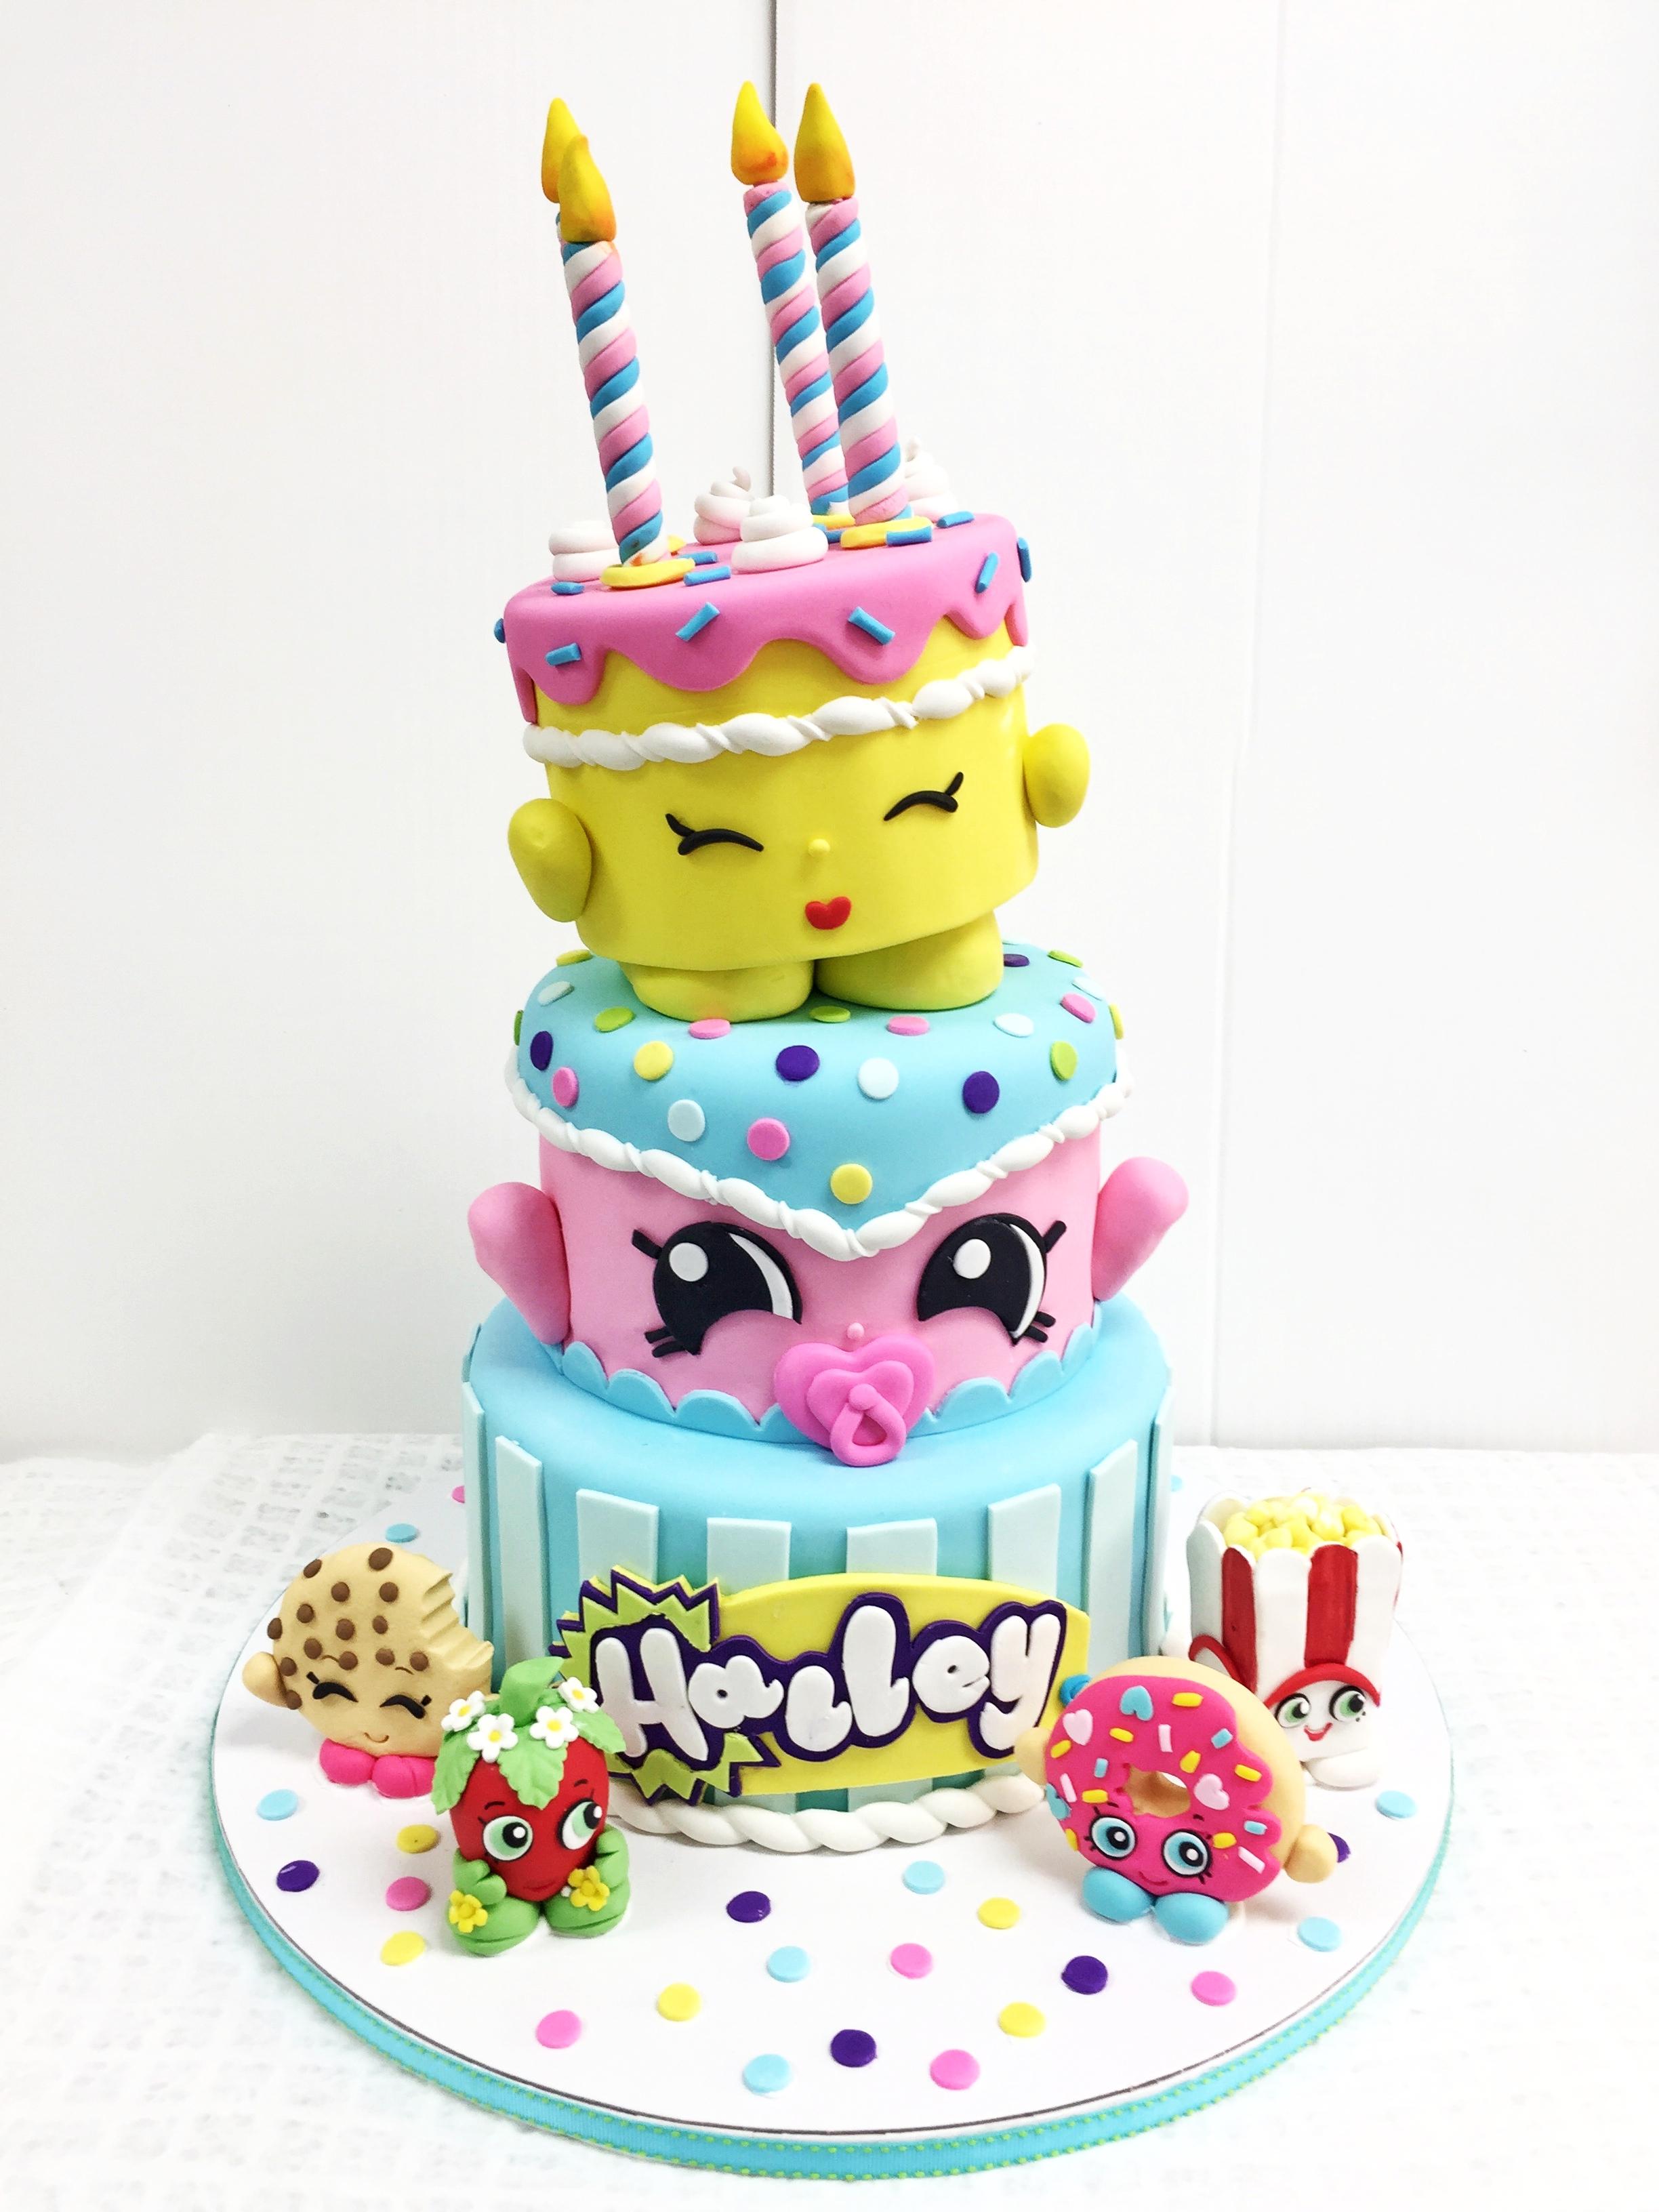 KIDS BIRTHDAY CAKES NEW The Cake Shop